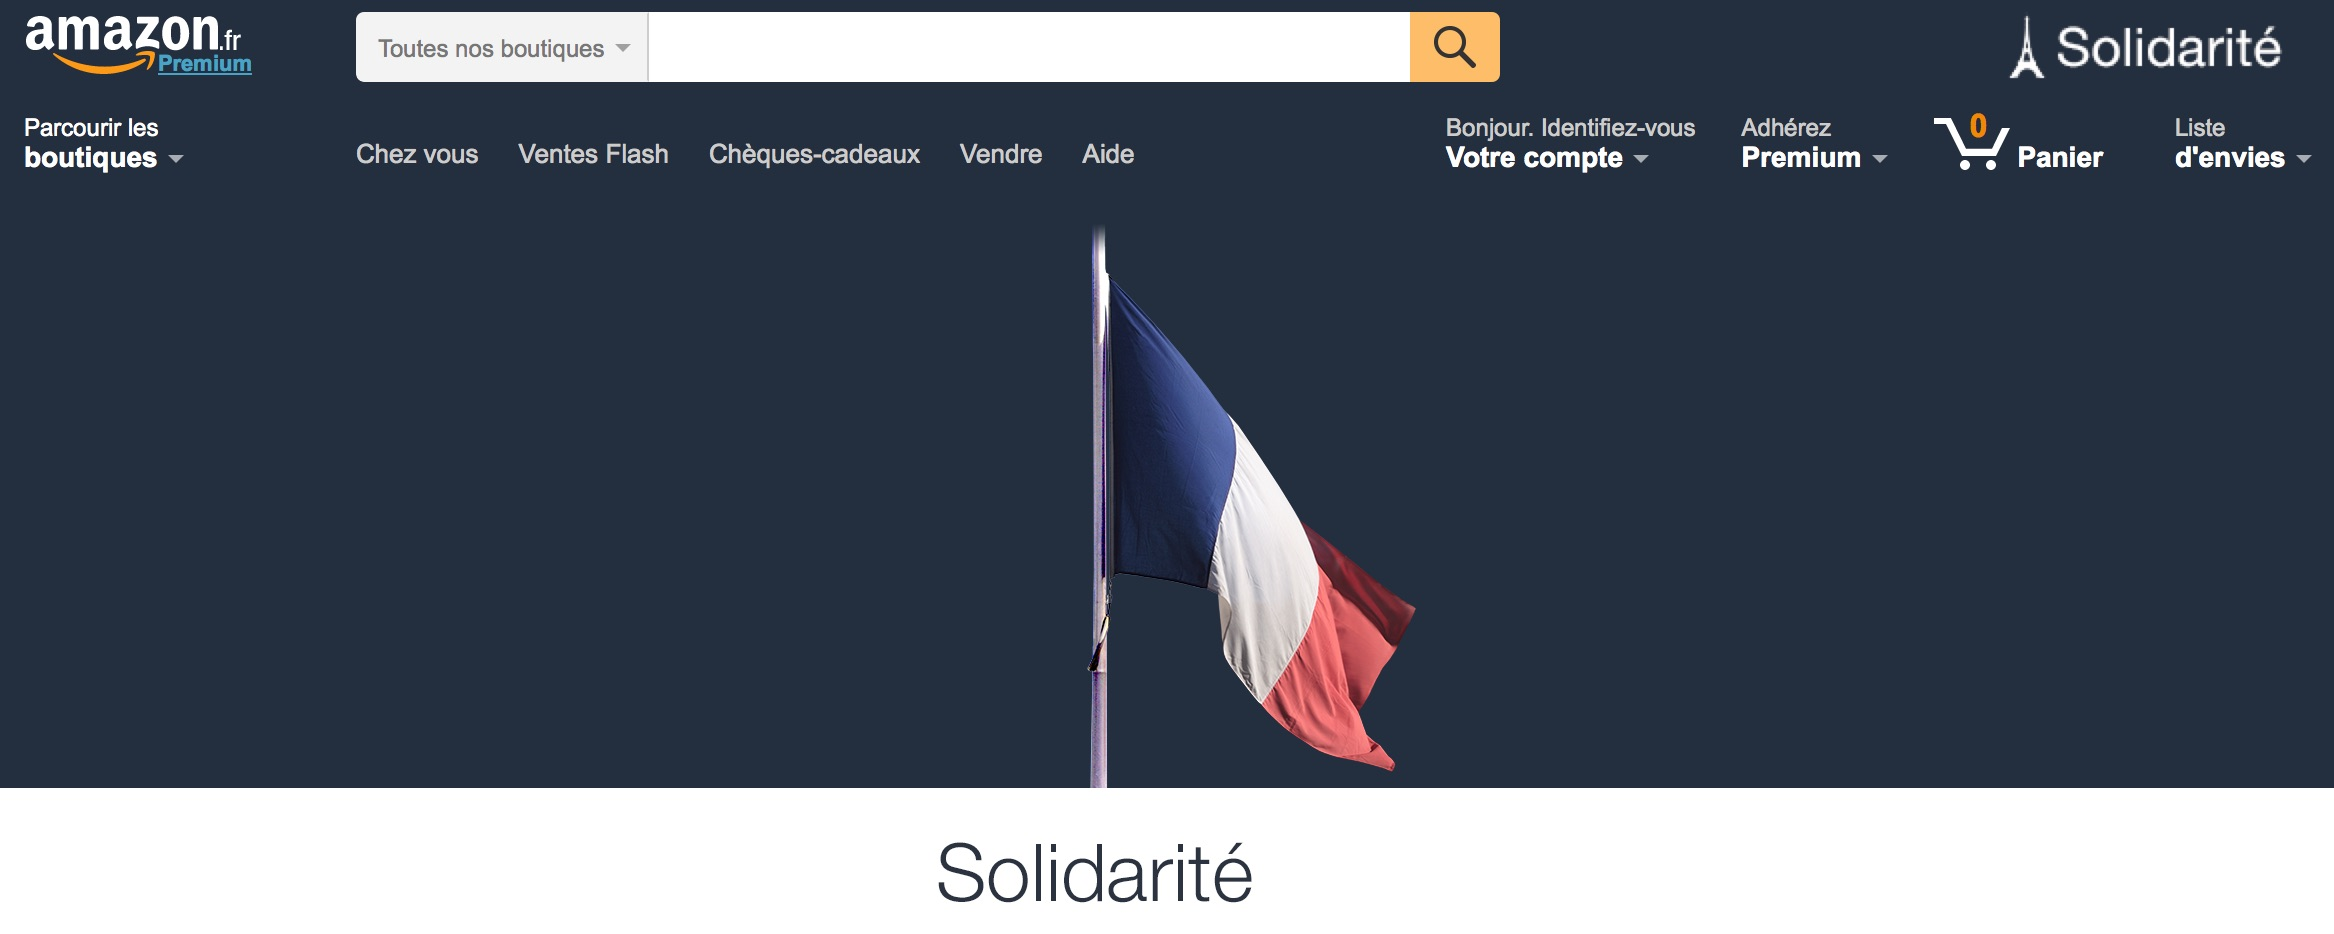 amazon-france-banner